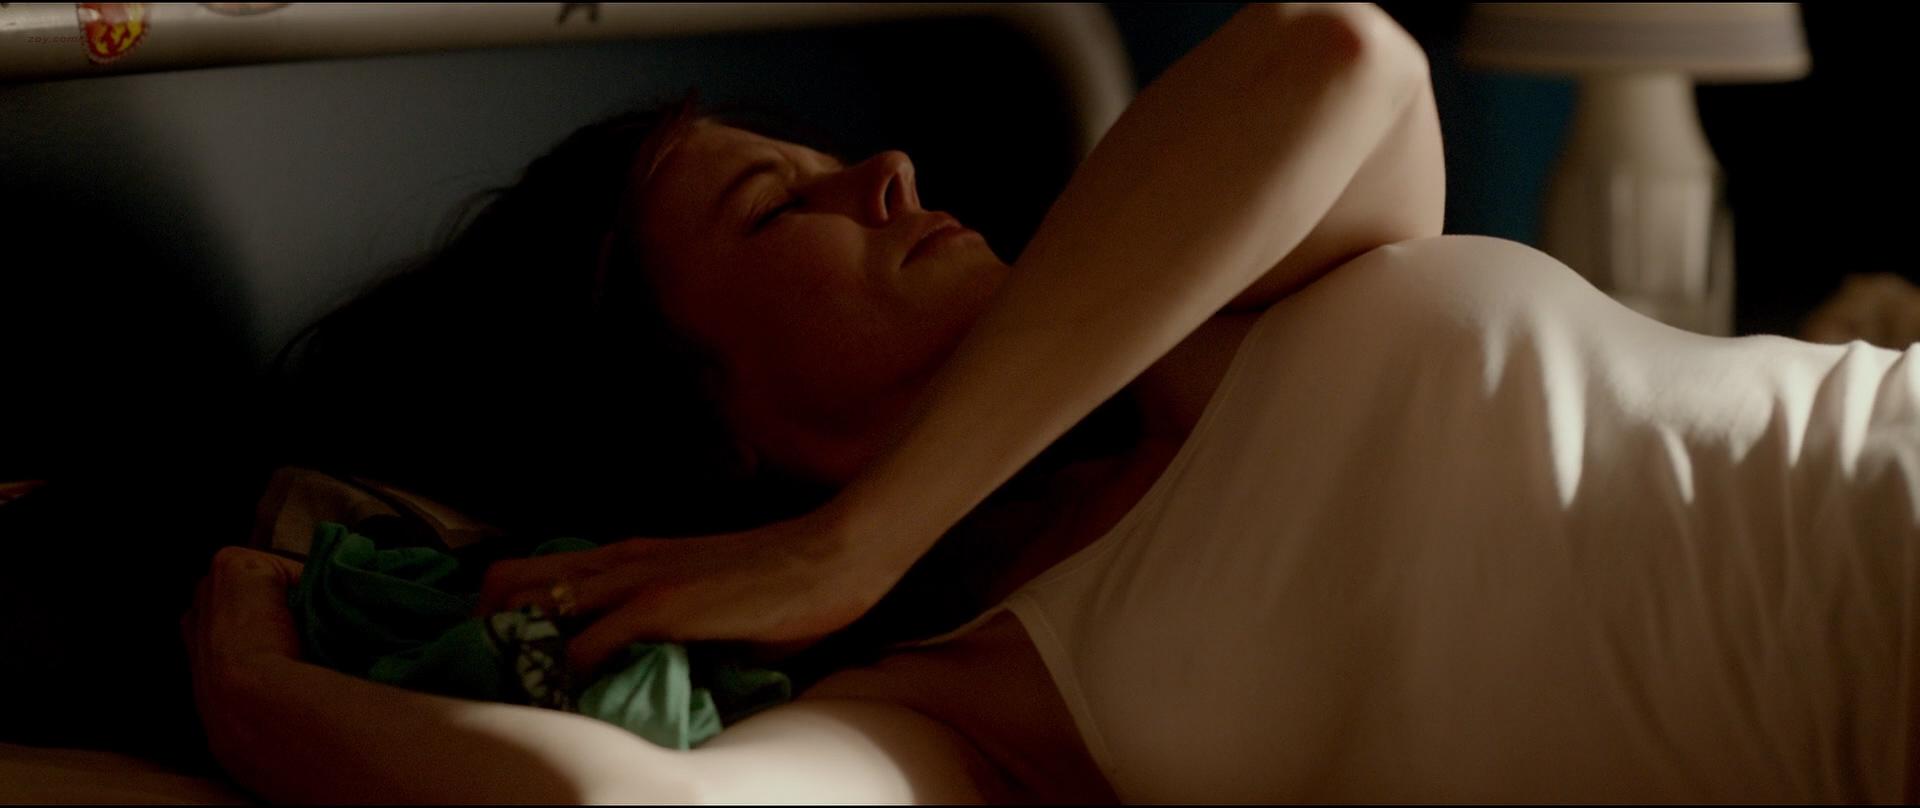 Nicole Kidman nude full frontal or bd and Madisson Brown hot - Strangerland (2015) hd1080p BluRay (7)